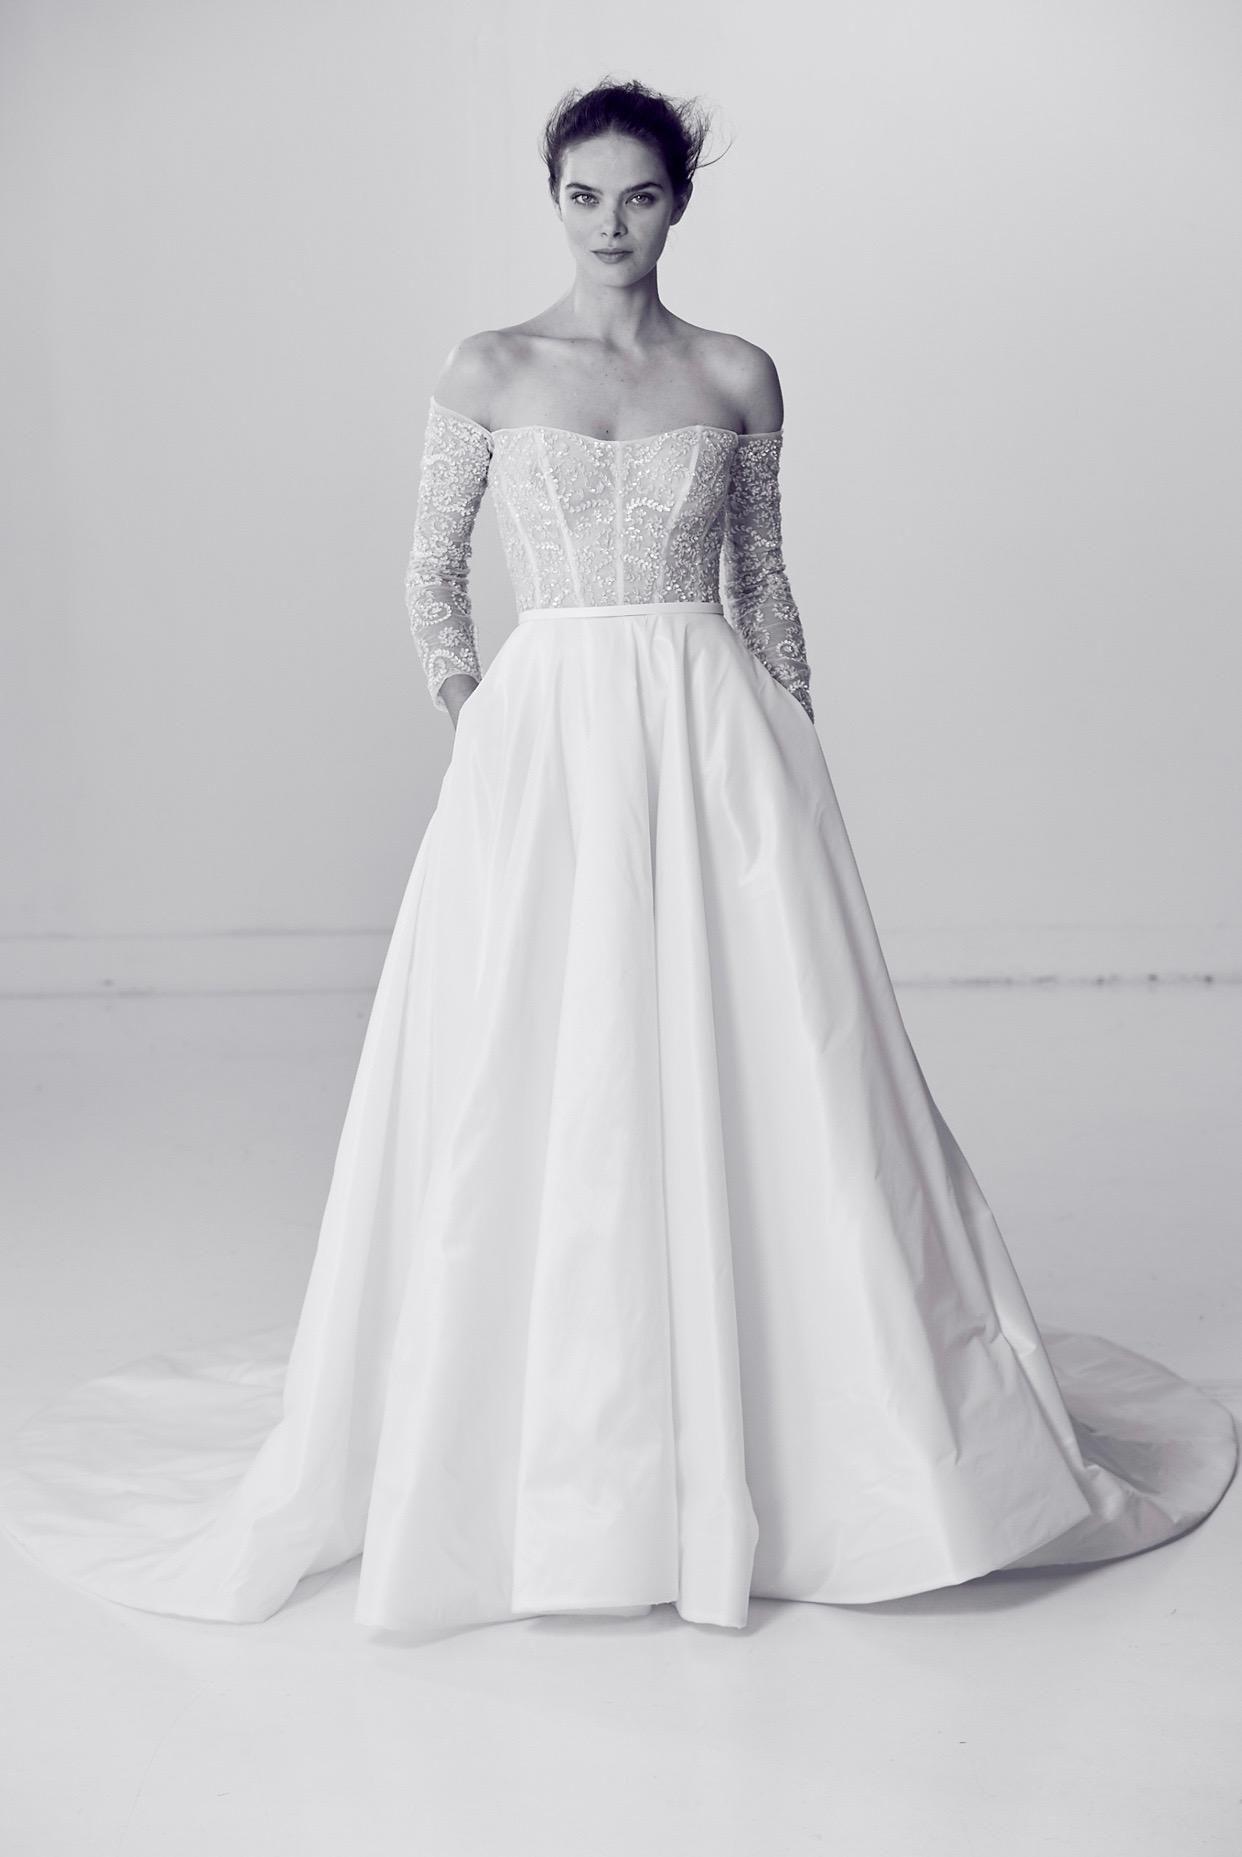 rivini-alyne-spring-2018-bridal-corset-gown Tendências de vestidos de noiva para 2018